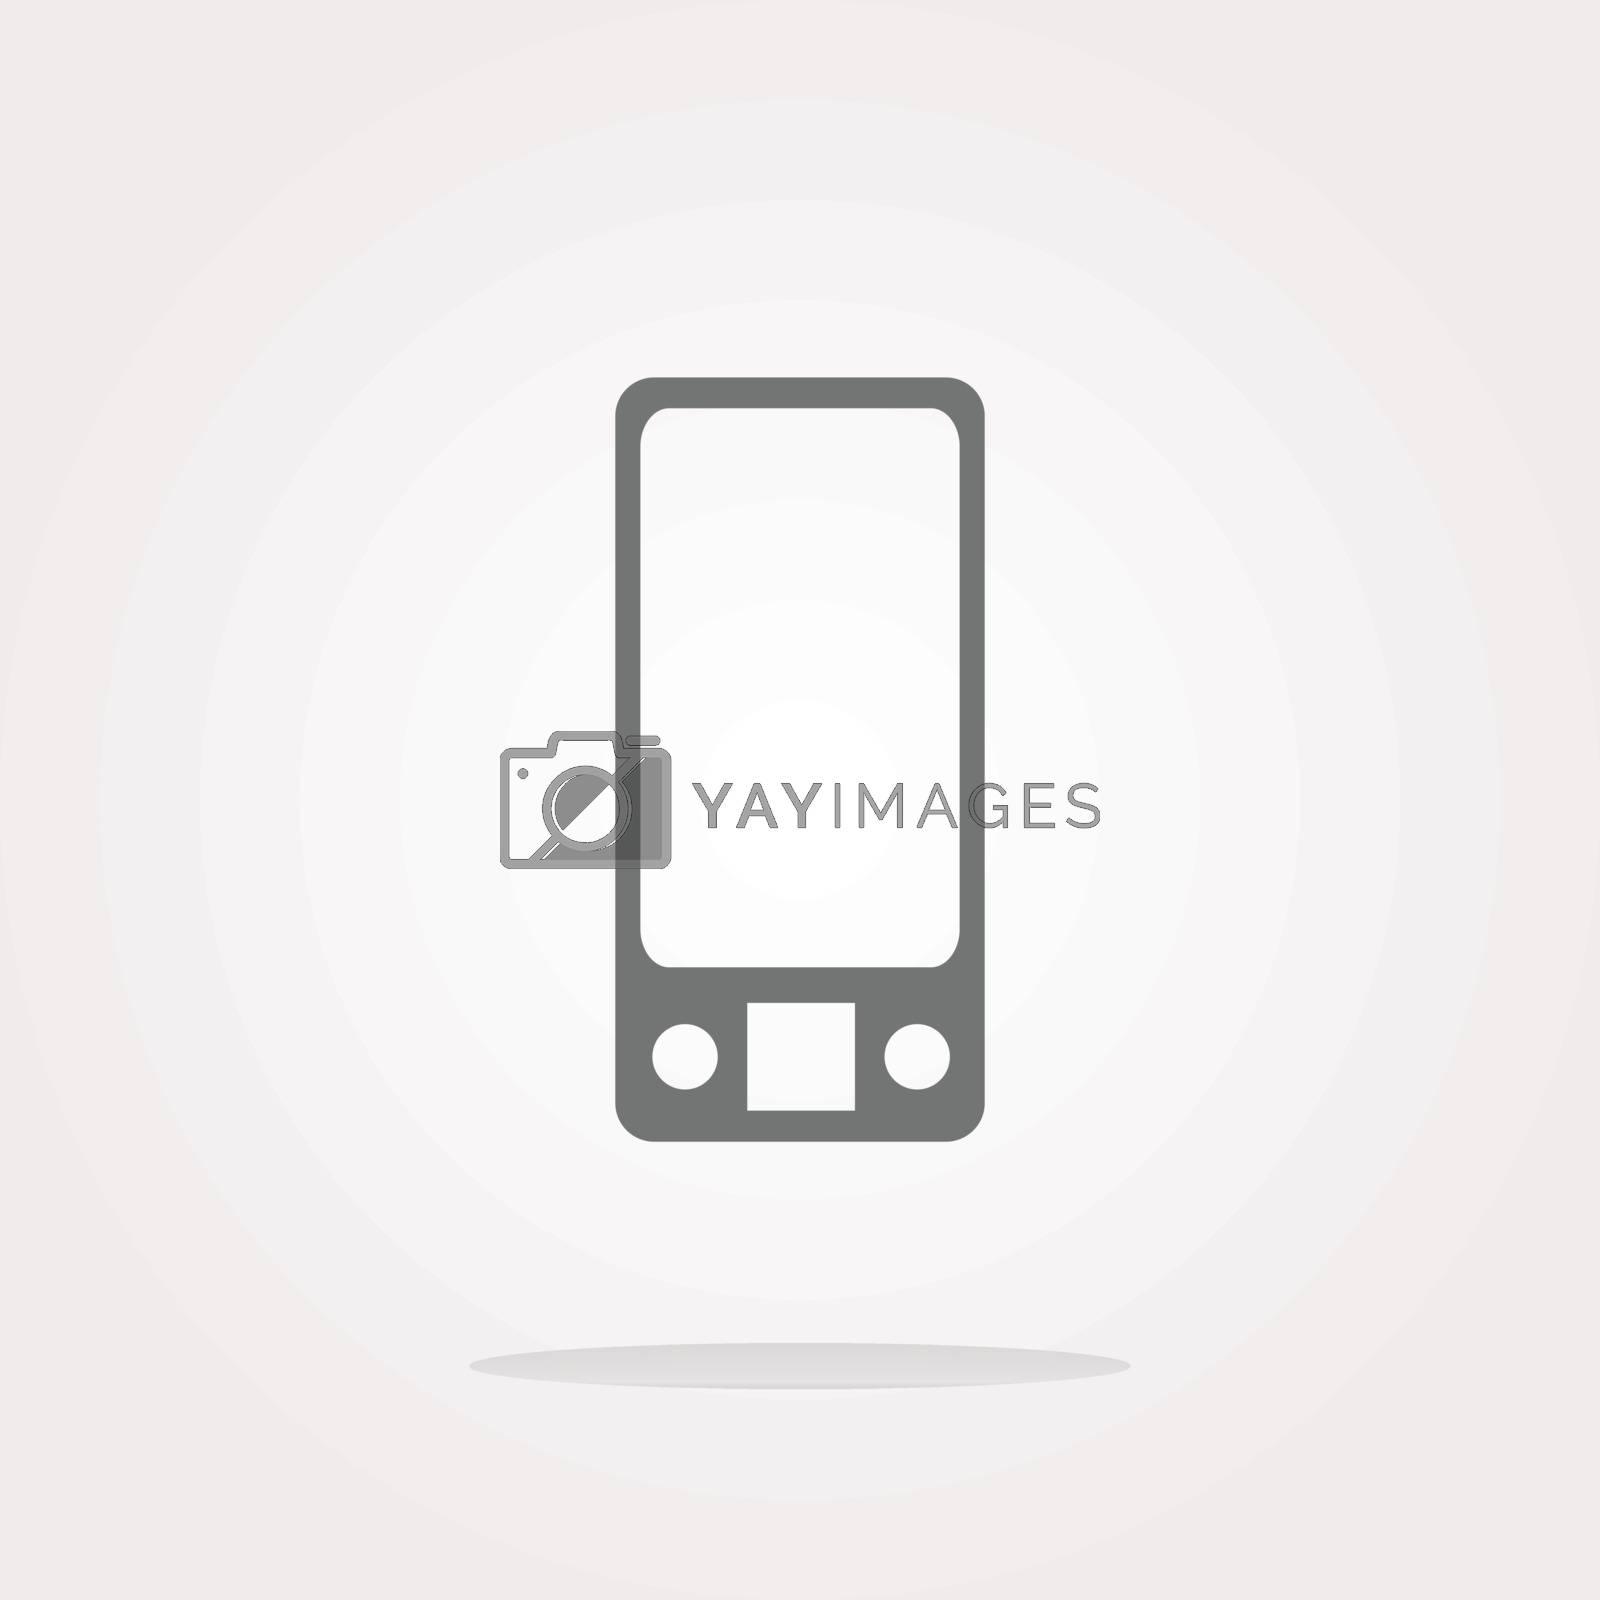 Mobile Icon Vector. Mobile Icon JPEG. Mobile Icon Picture. Mobile Icon Image. Mobile Icon Graphic. Mobile Icon Art. Mobile Icon JPG. Mobile Icon flat. Mobile Icon app. Mobile Icon Drawing